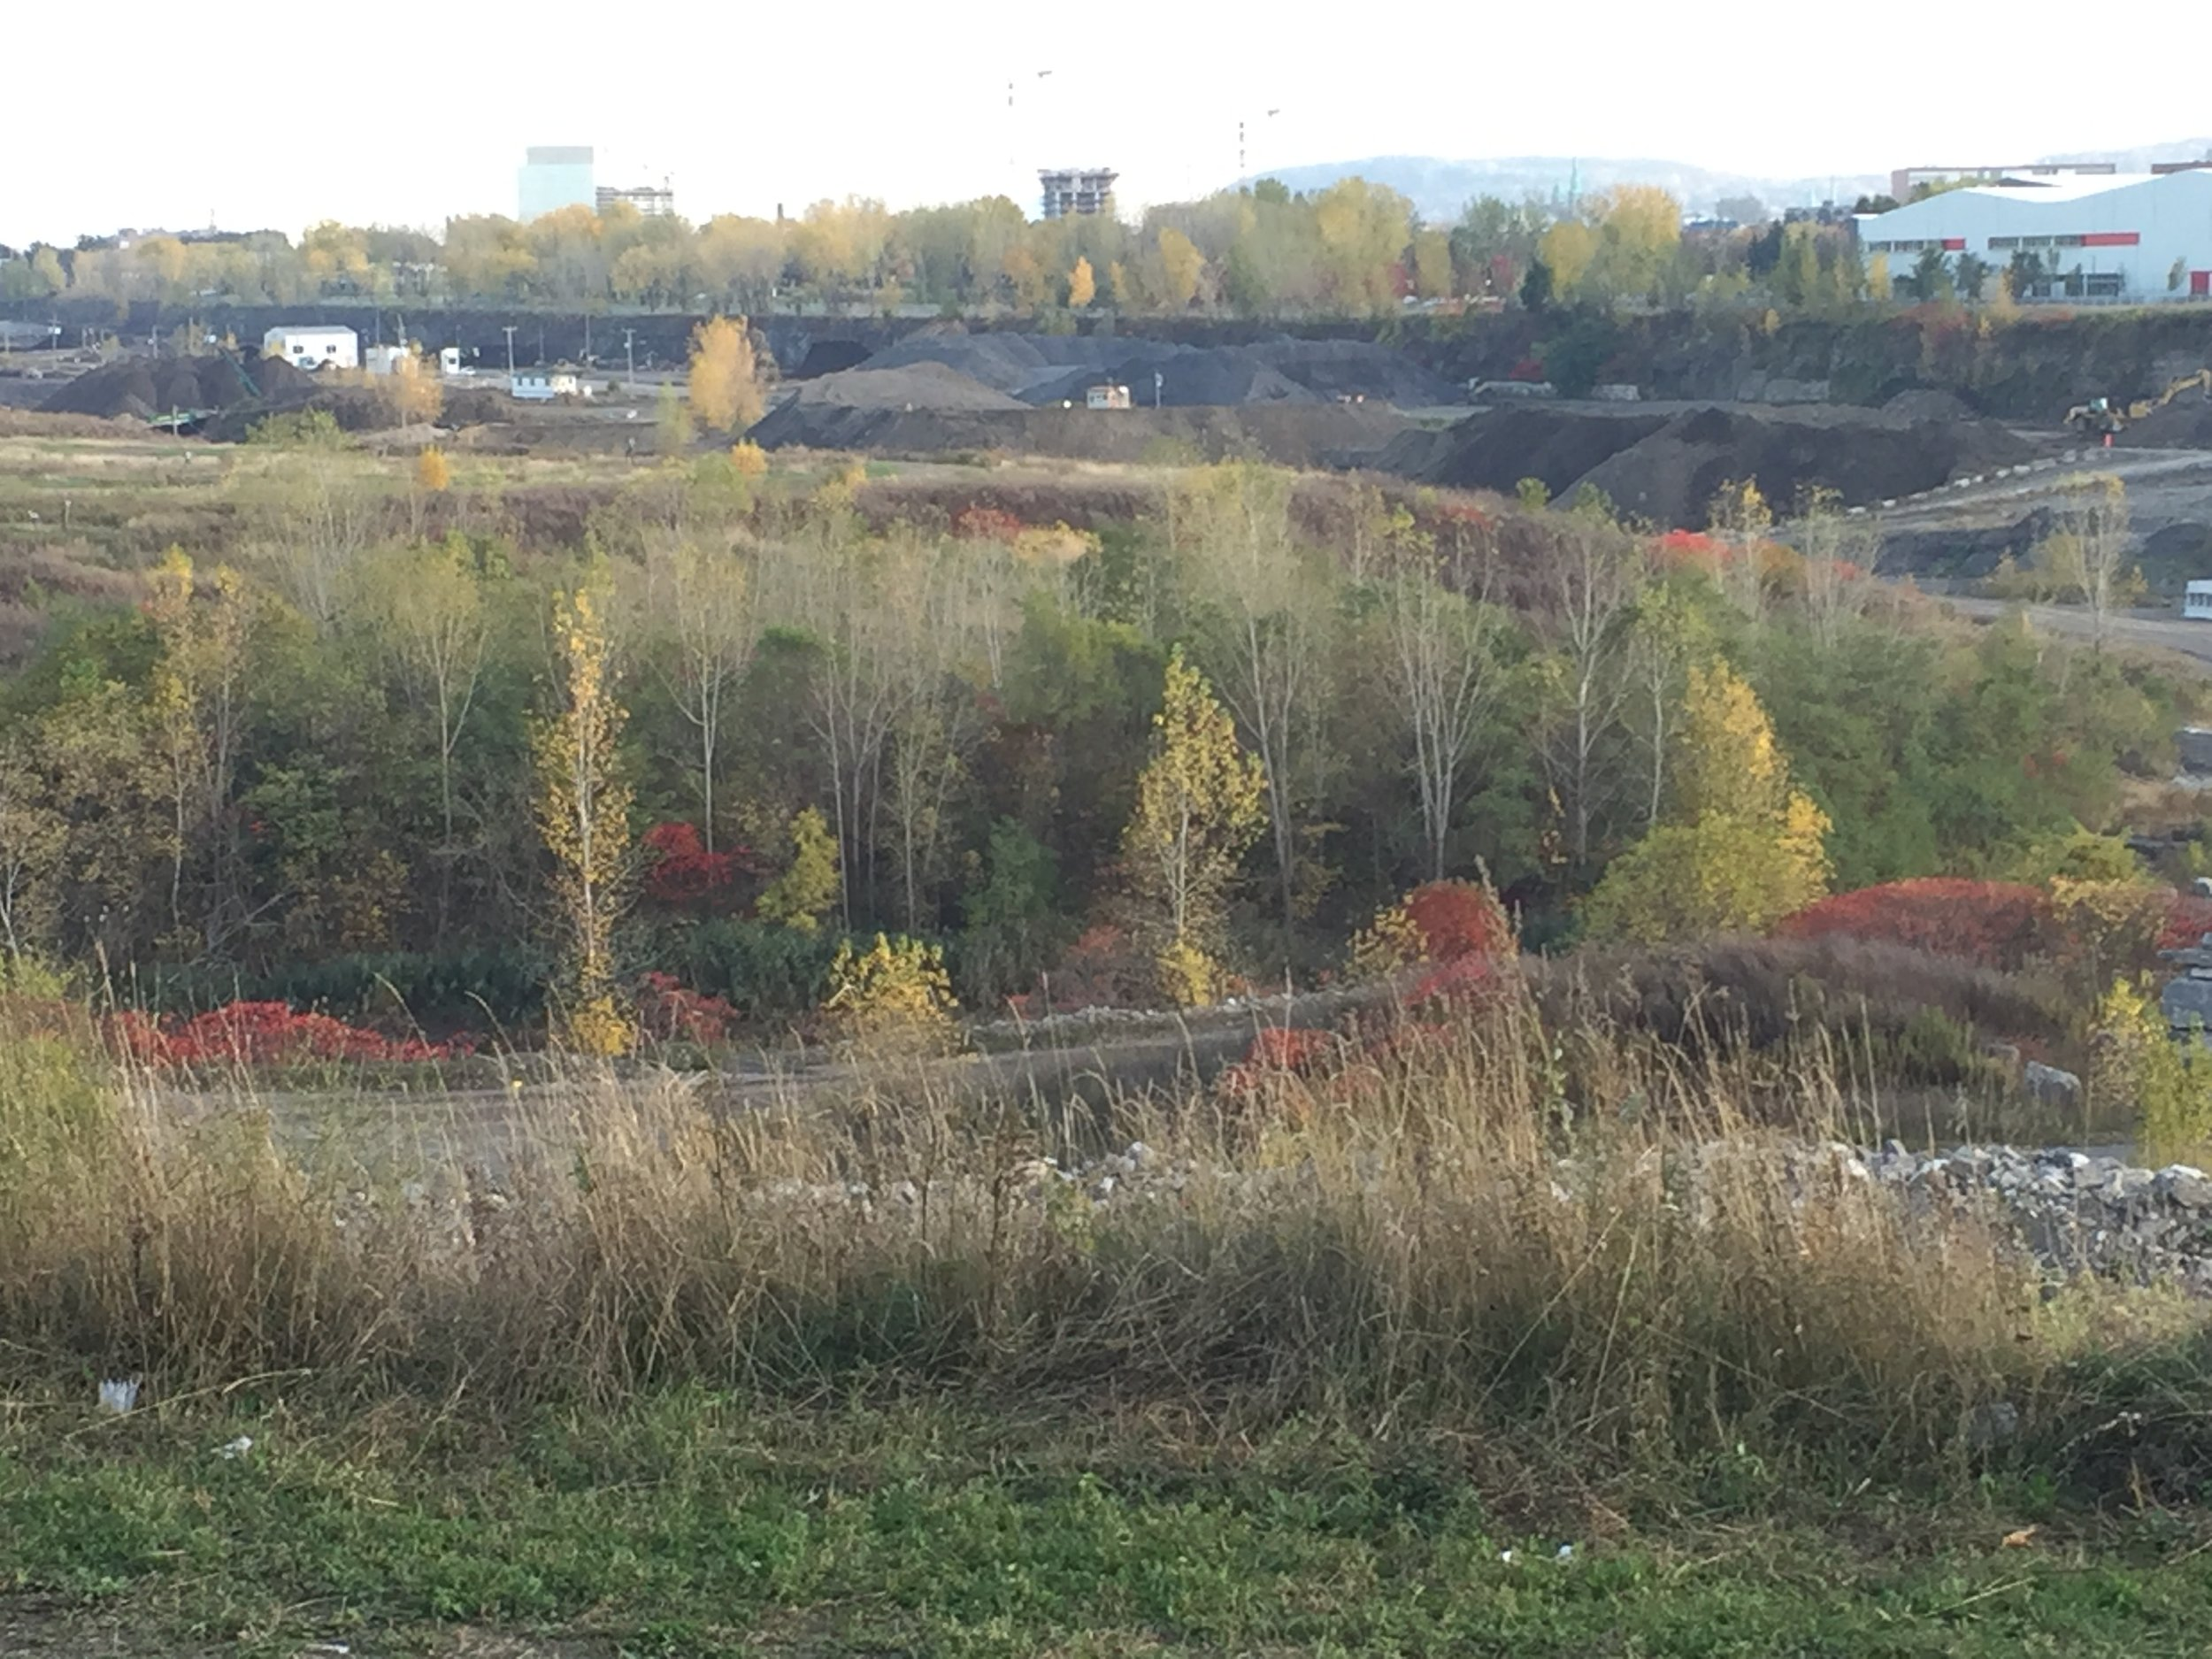 Complexe Environnemental de Saint-Michel, in the Fall